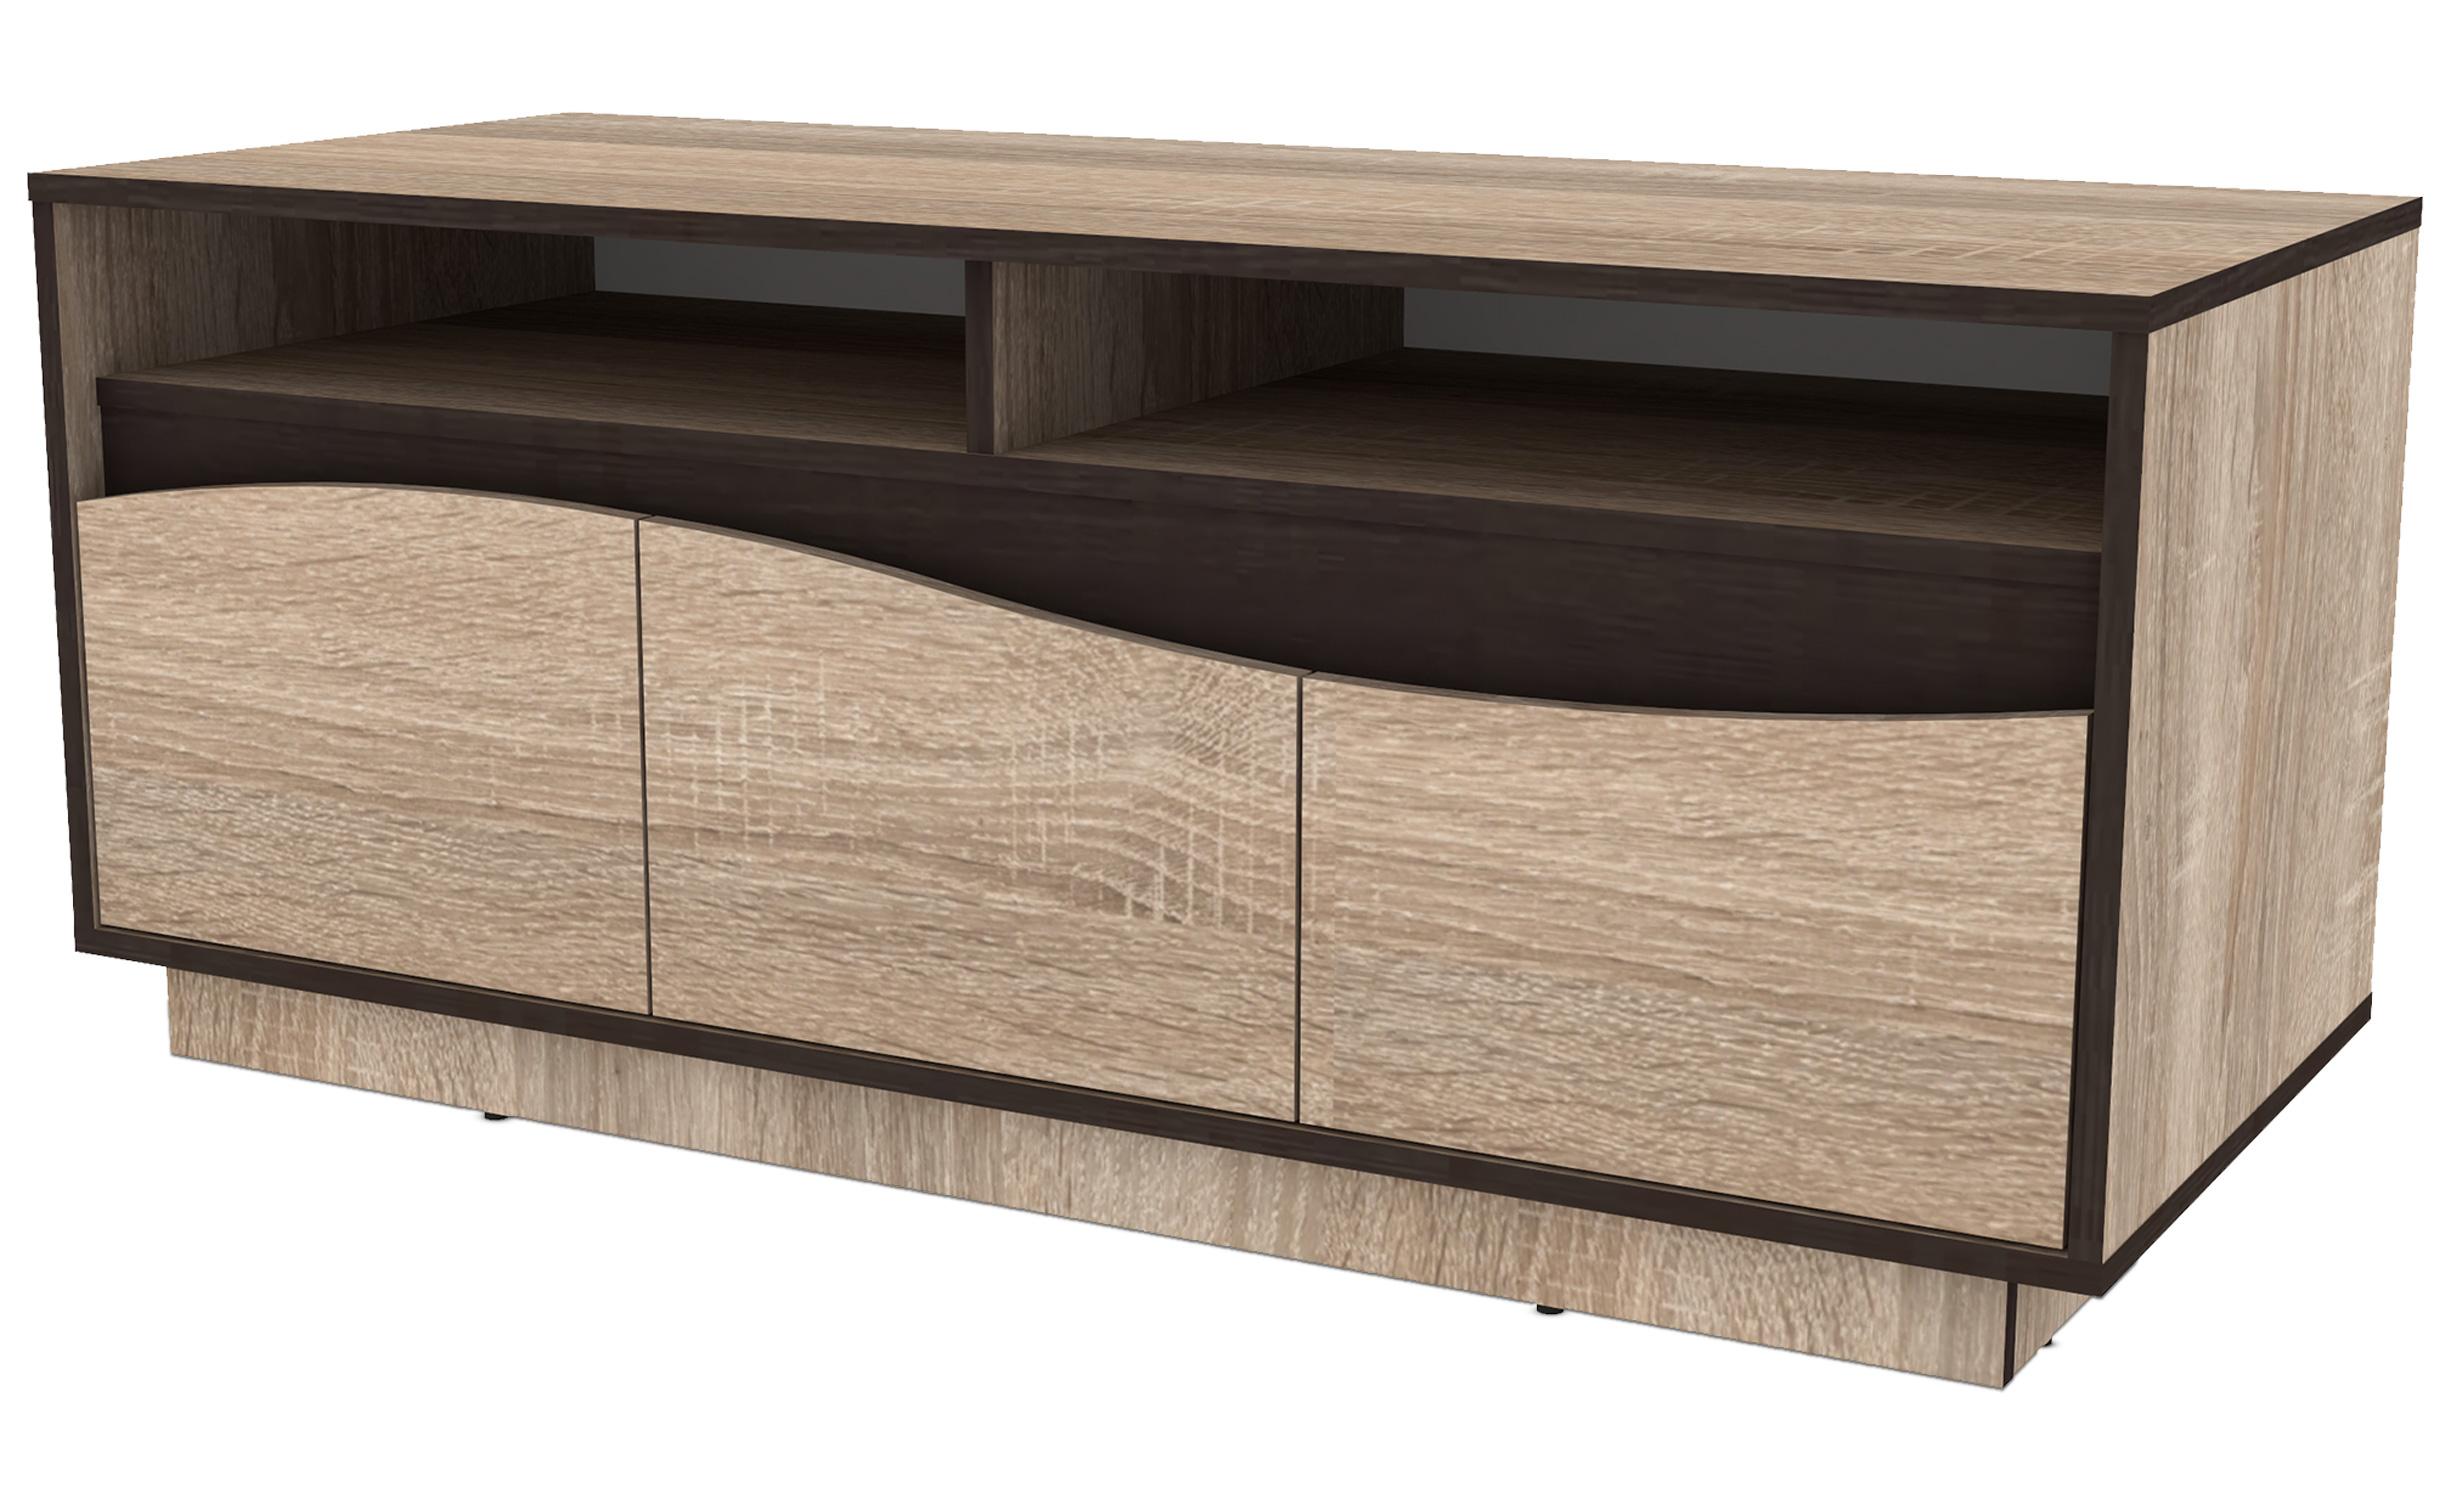 Meuble TV 120cm avec 3 tiroirs Genevaro Chêne clair